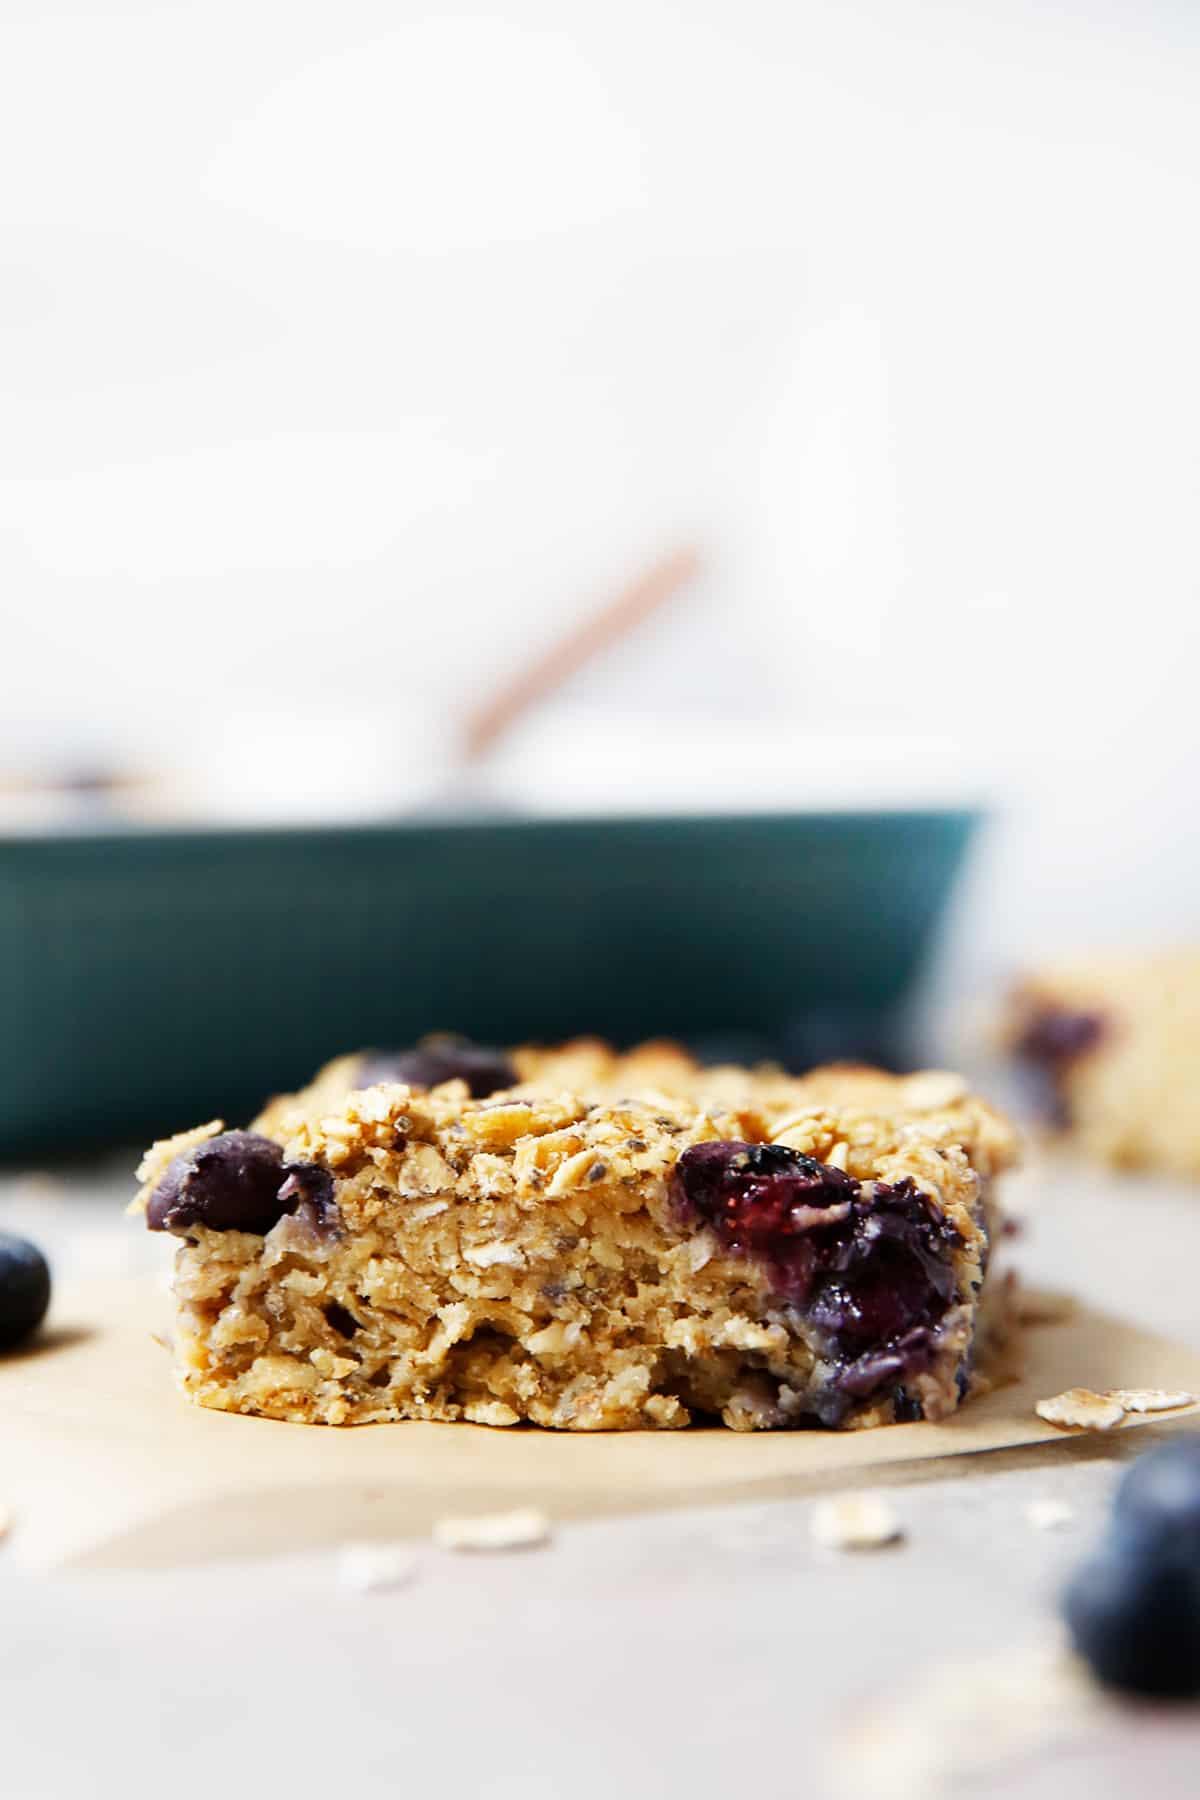 Up close shot of blueberry oatmeal bake